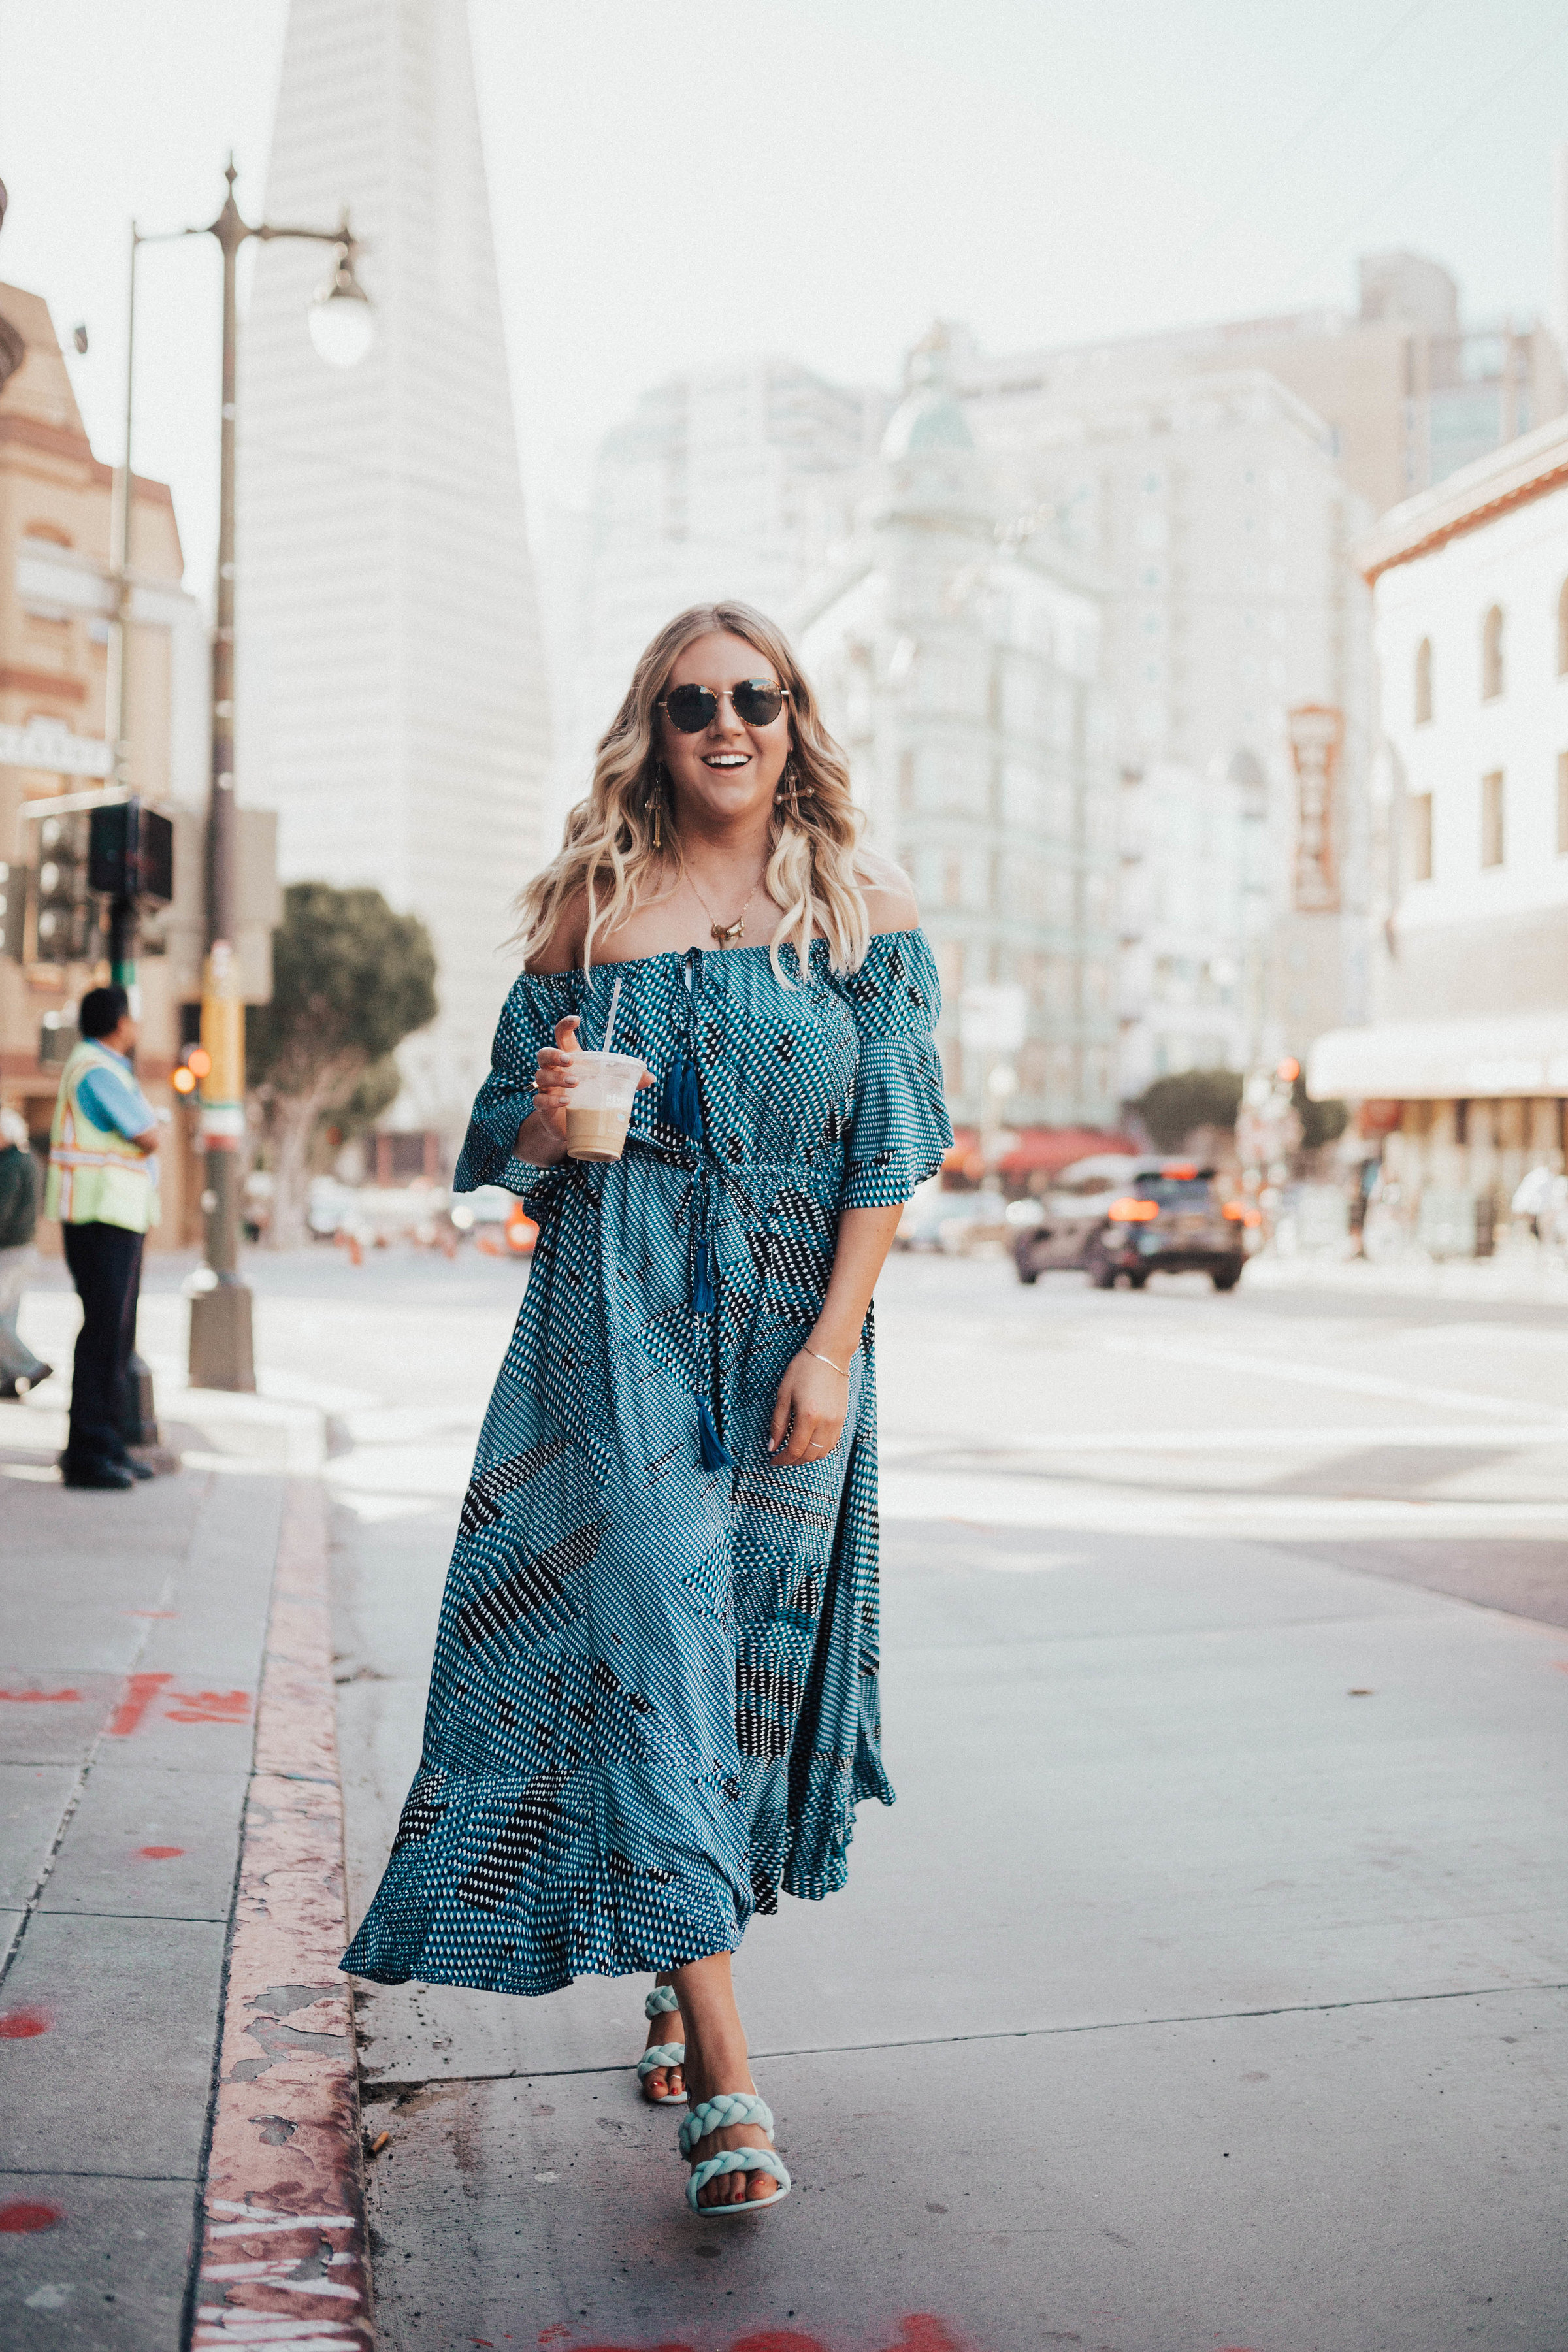 via Thea: Off the shoulder blue SheIn dress, BP sunnies